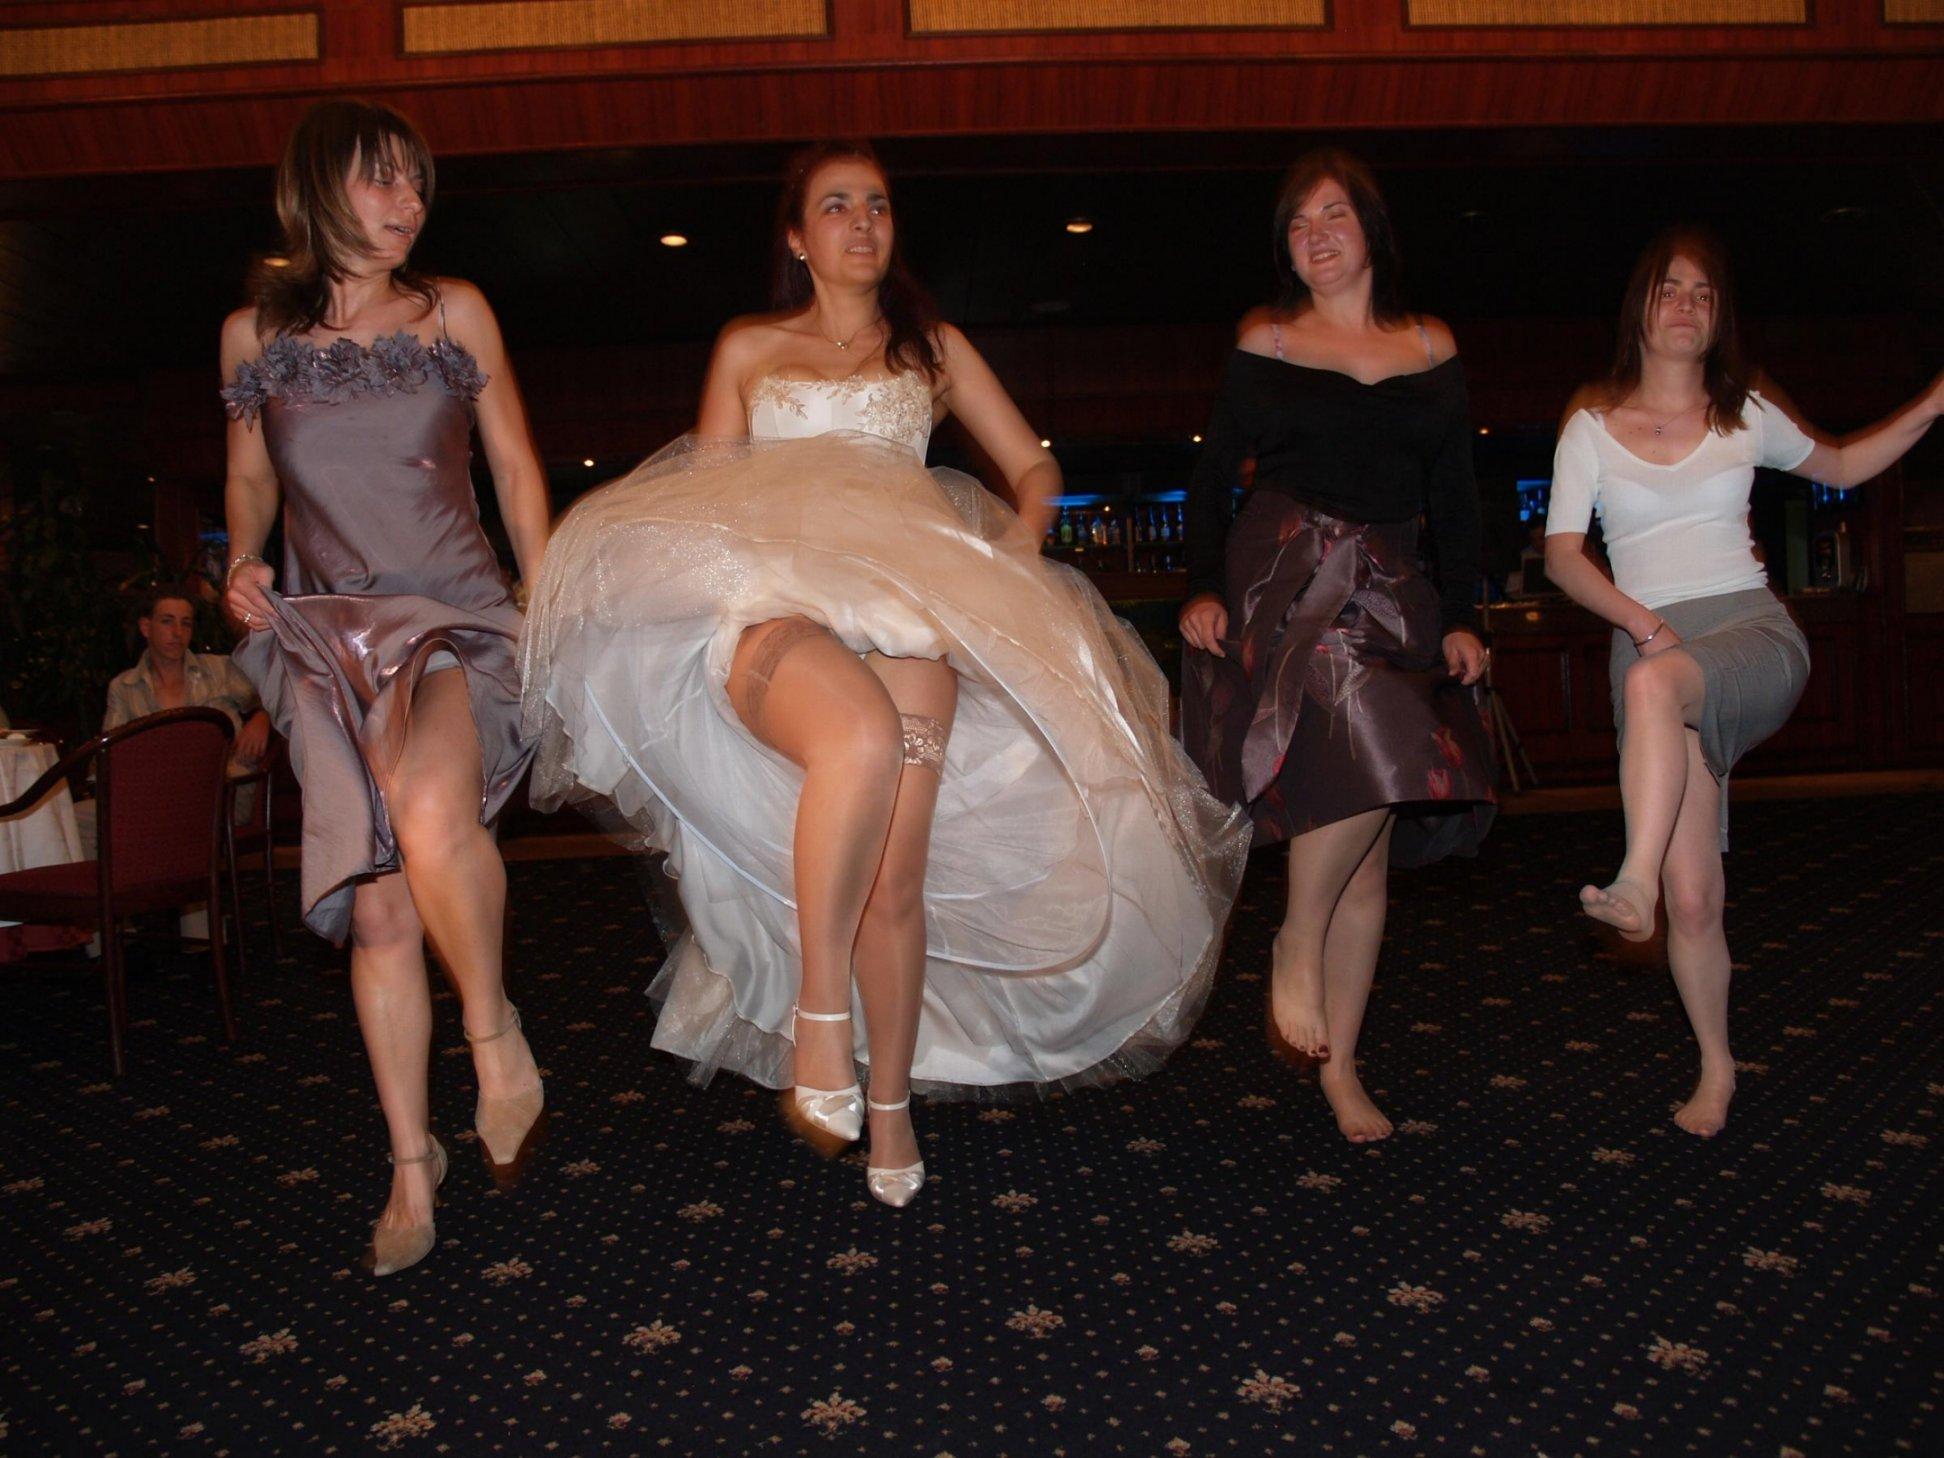 Секс на сватбе 11 фотография